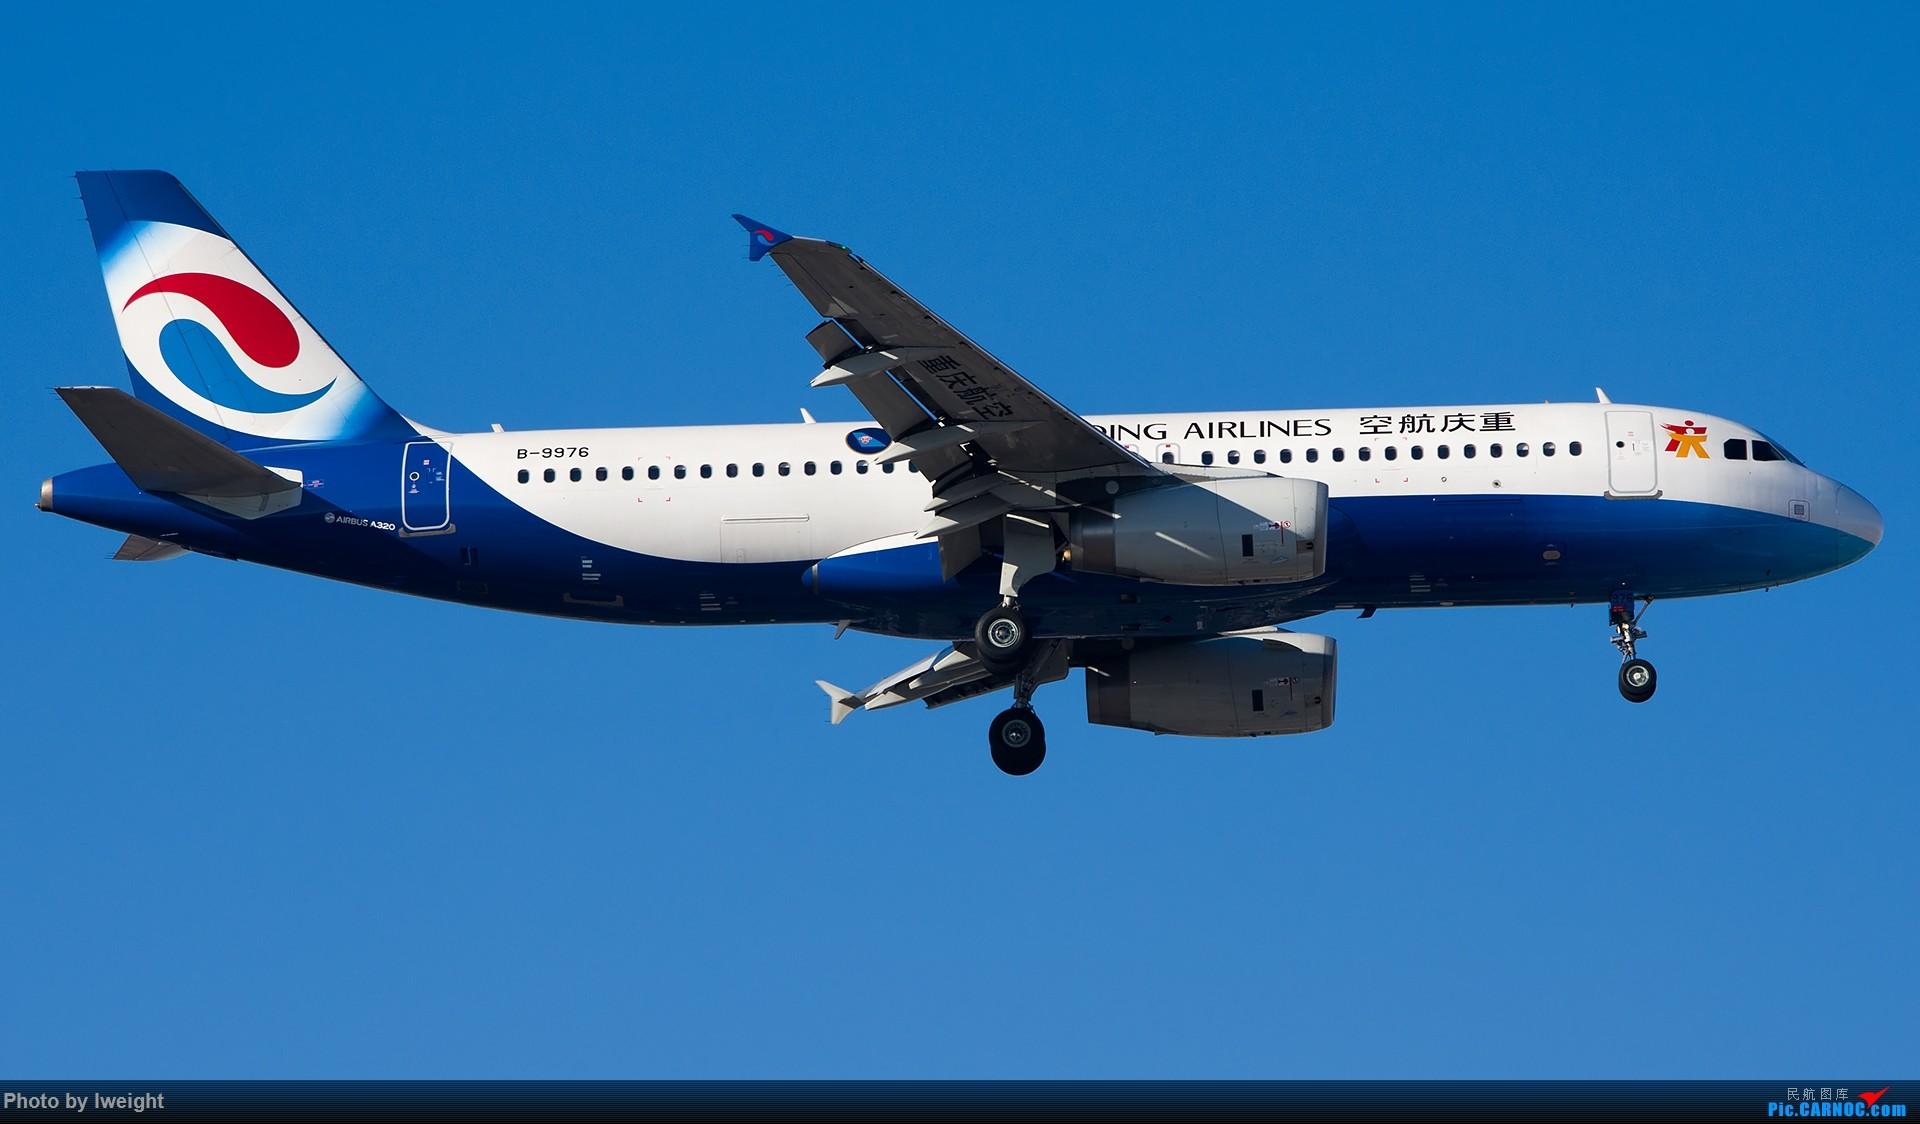 Re:终于在12月的北京等到了一个晴天的周末,出来拍拍飞机【2015-12-5】 AIRBUS A320-200 B-9976 中国北京首都国际机场